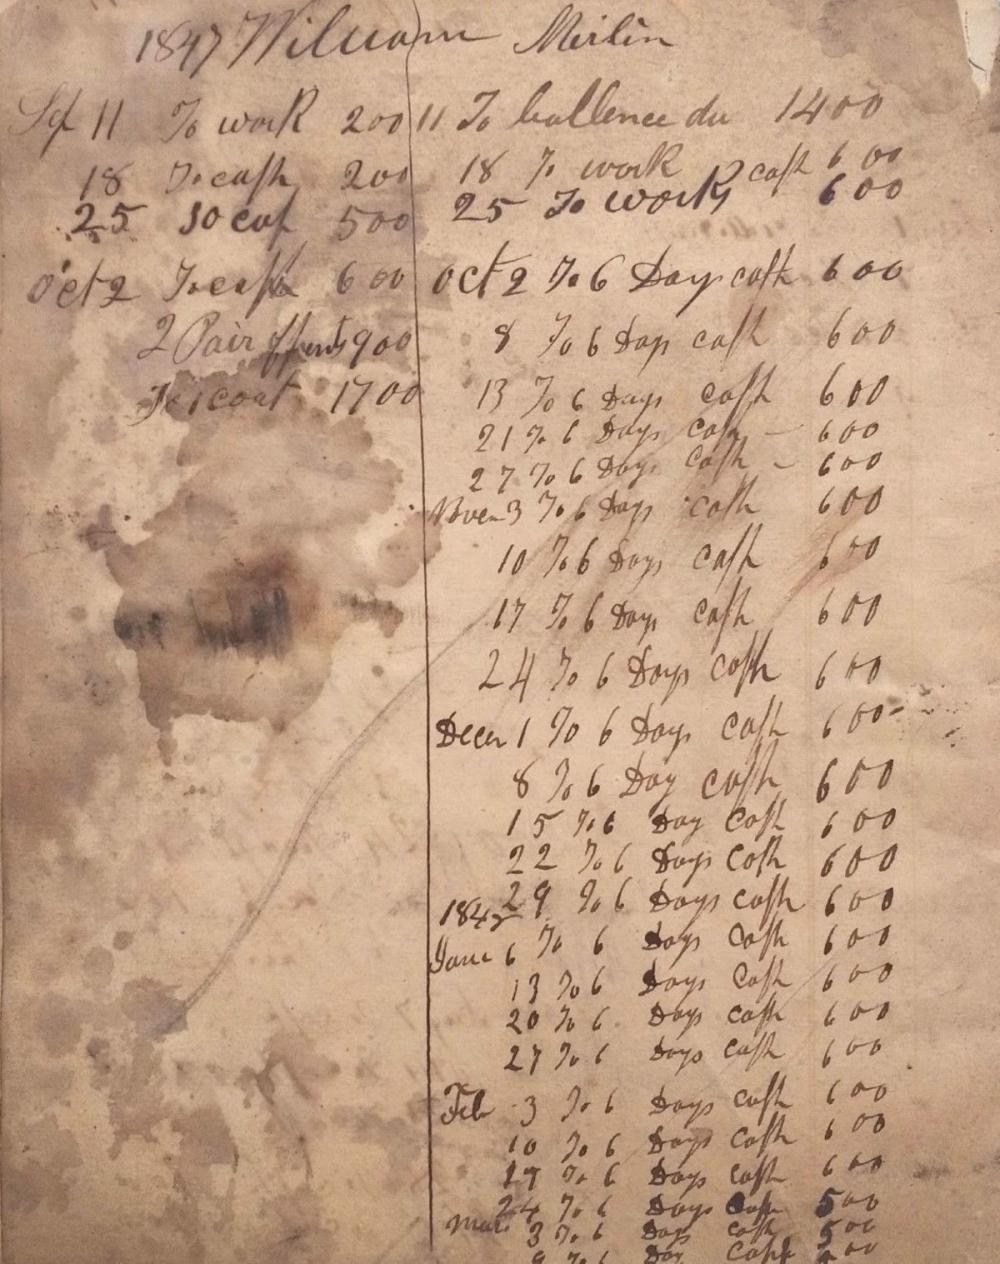 Pre-Civil War work diary